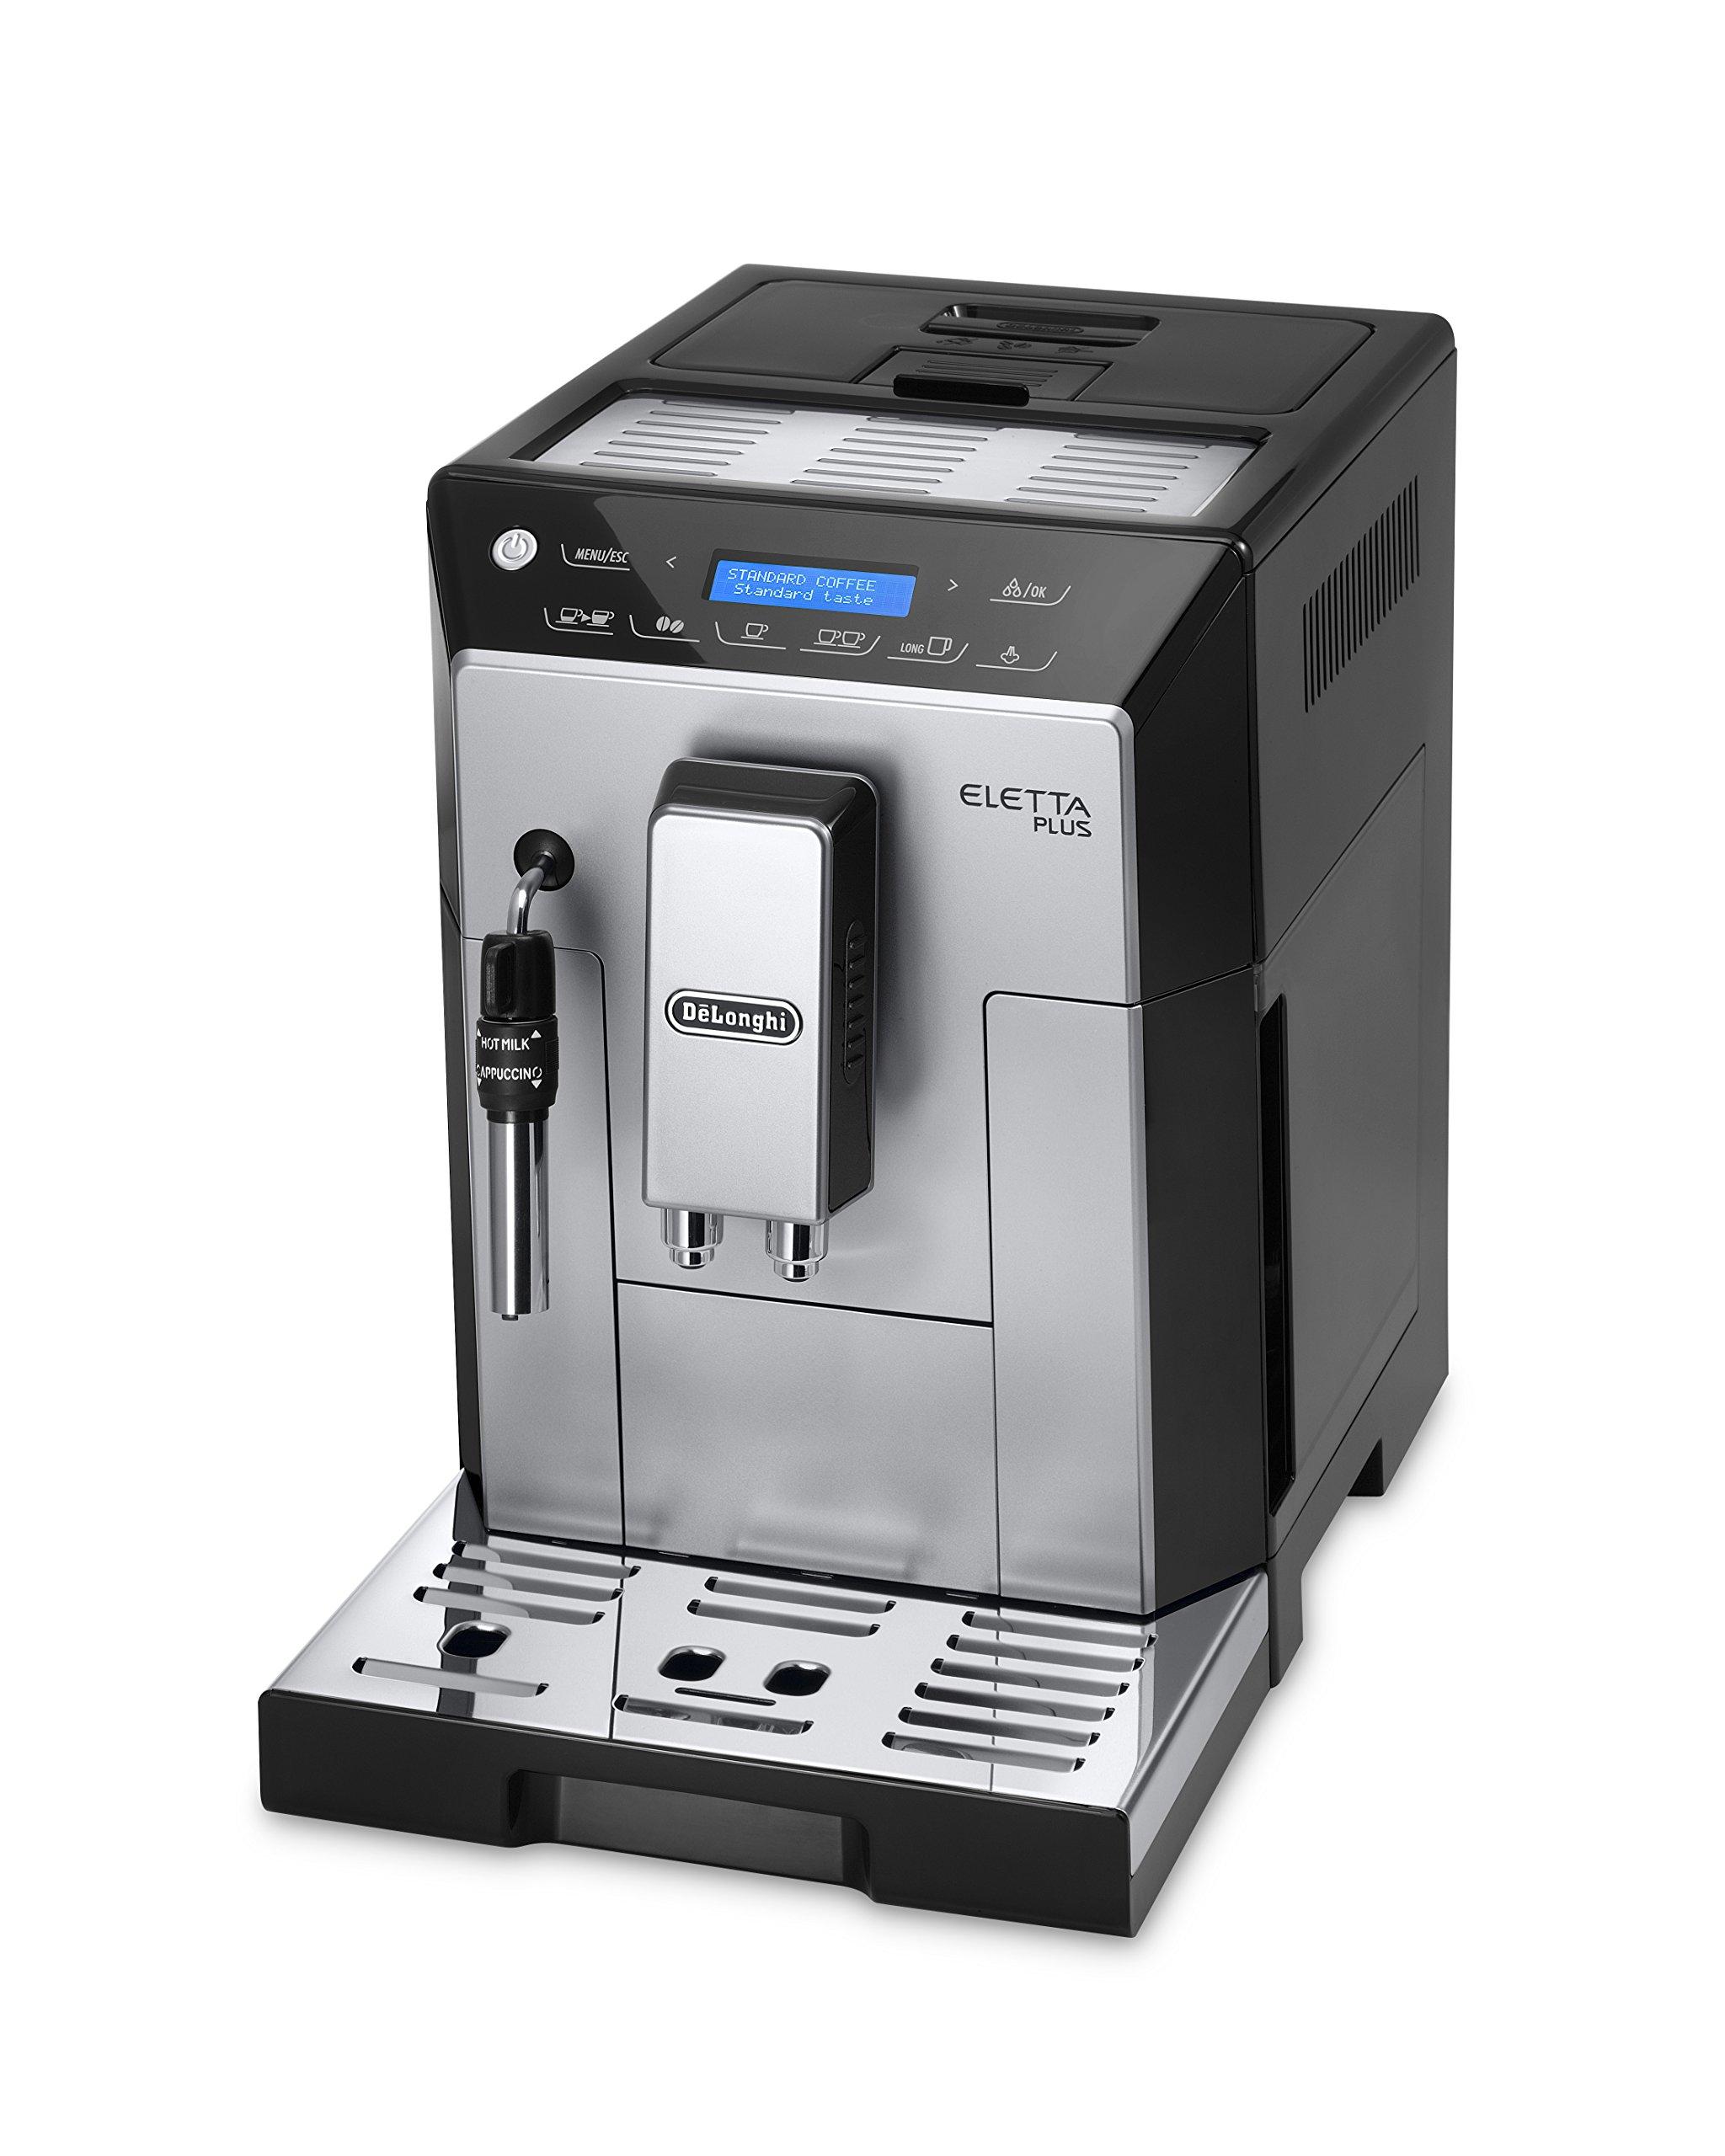 DeLonghi-ECAM-44620S-Kaffeevollautomant-Edelstahl-2-liters-Schwarz-Silber